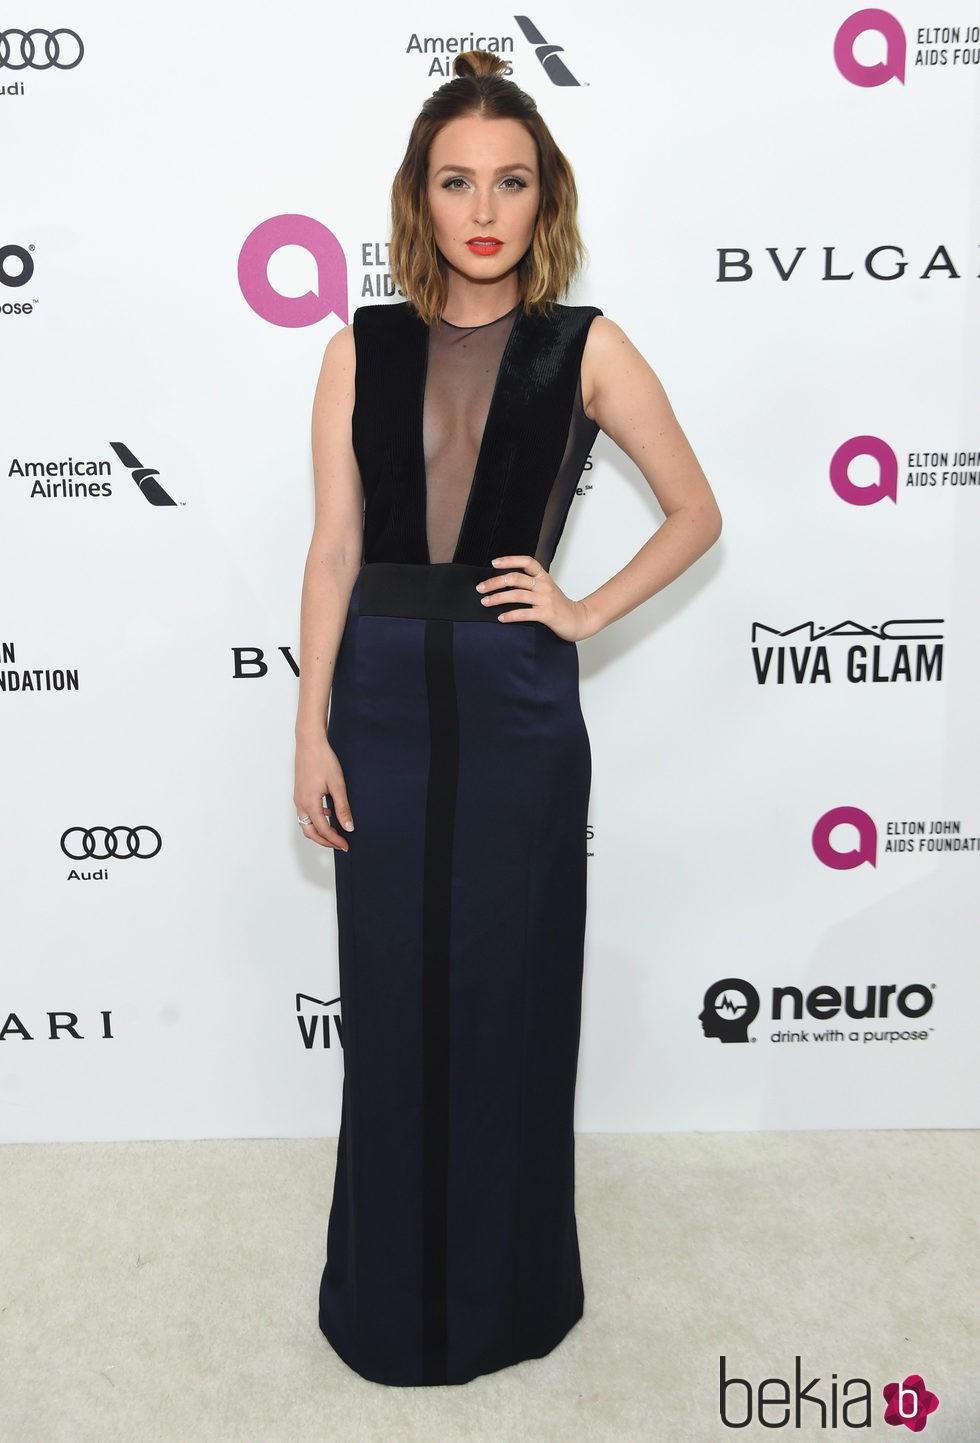 Camilla Luddington en la fiesta de Elton John tras los Oscar 2016